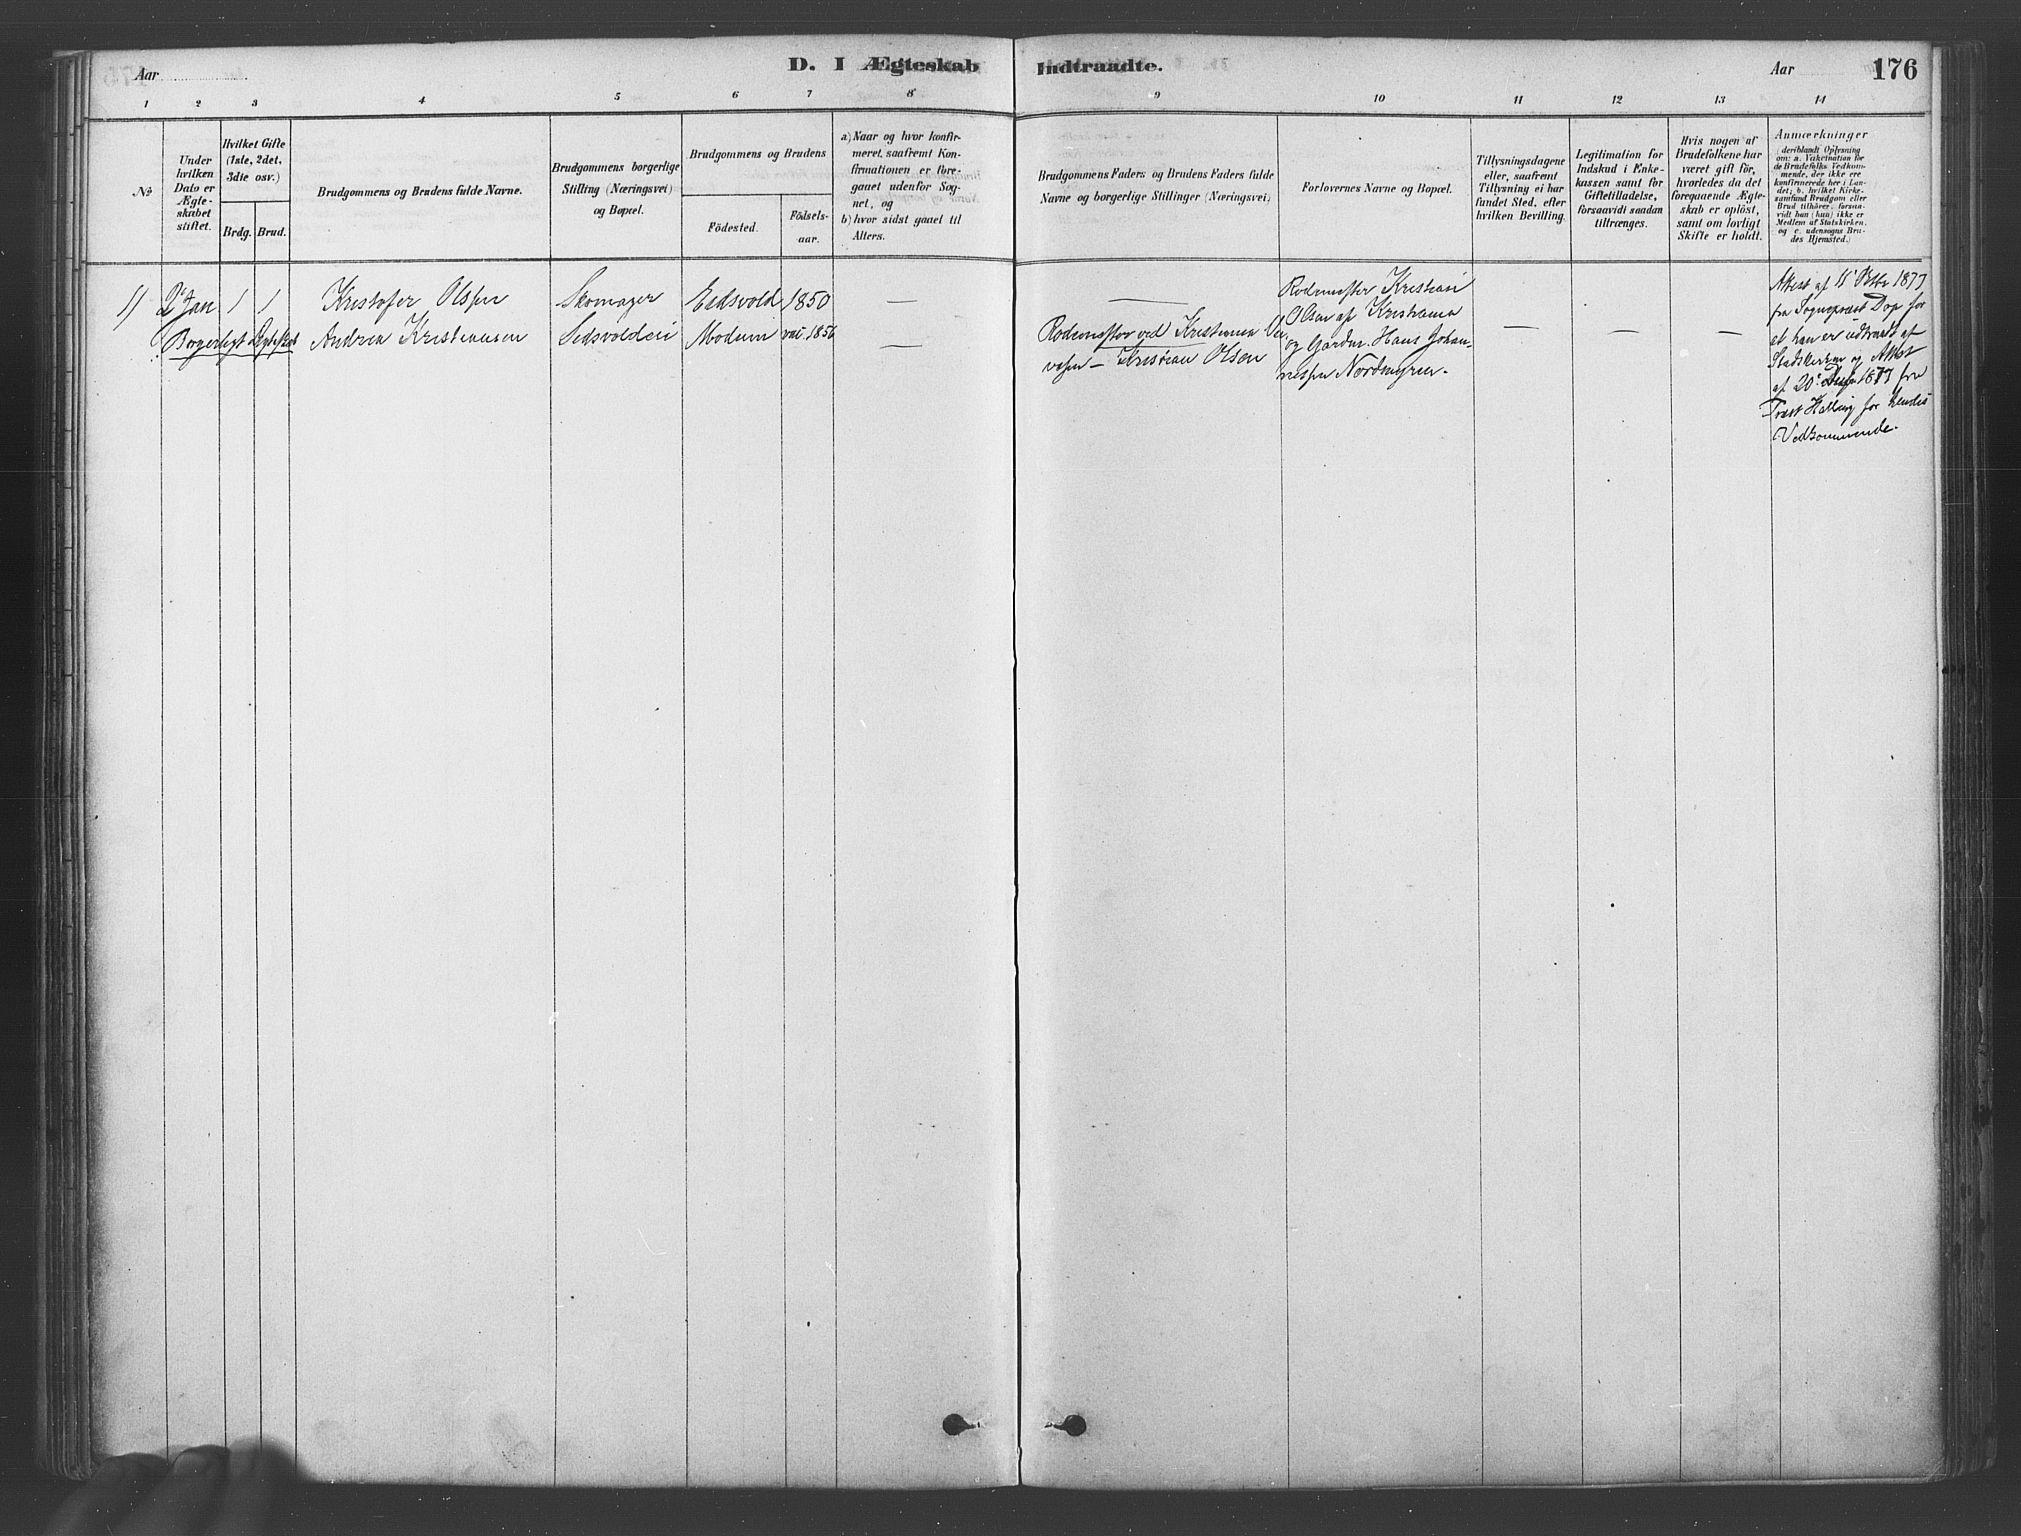 SAO, Ullensaker prestekontor Kirkebøker, F/Fb/L0001: Ministerialbok nr. II 1, 1878-1893, s. 176